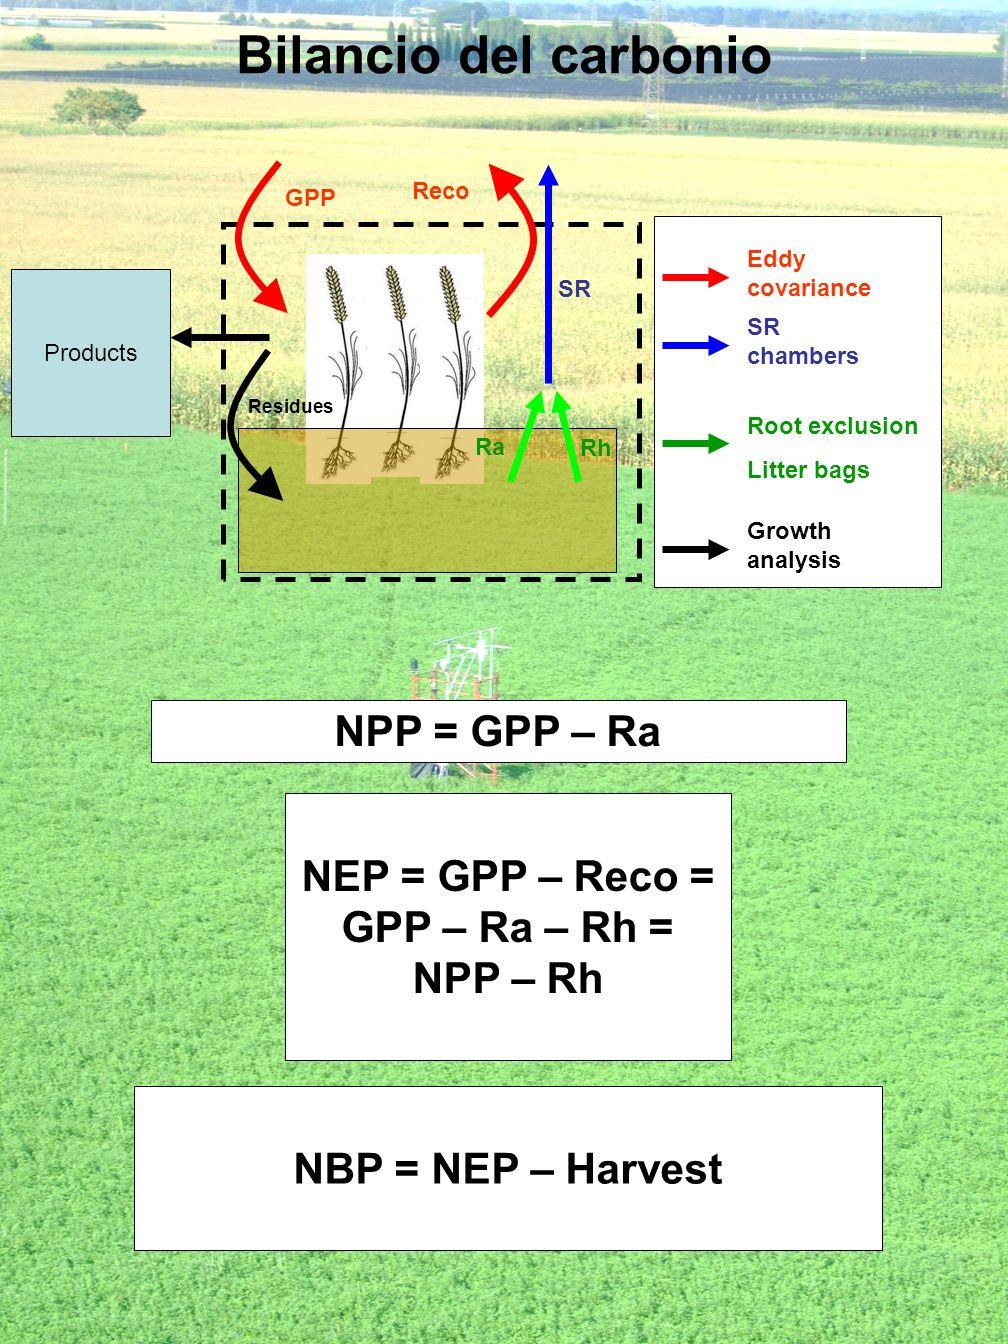 Bilancio del carbonio Products Residues GPP Reco SR Ra Rh Eddy covariance SR chambers Root exclusion Litter bags Growth analysis NPP = GPP – Ra NEP =